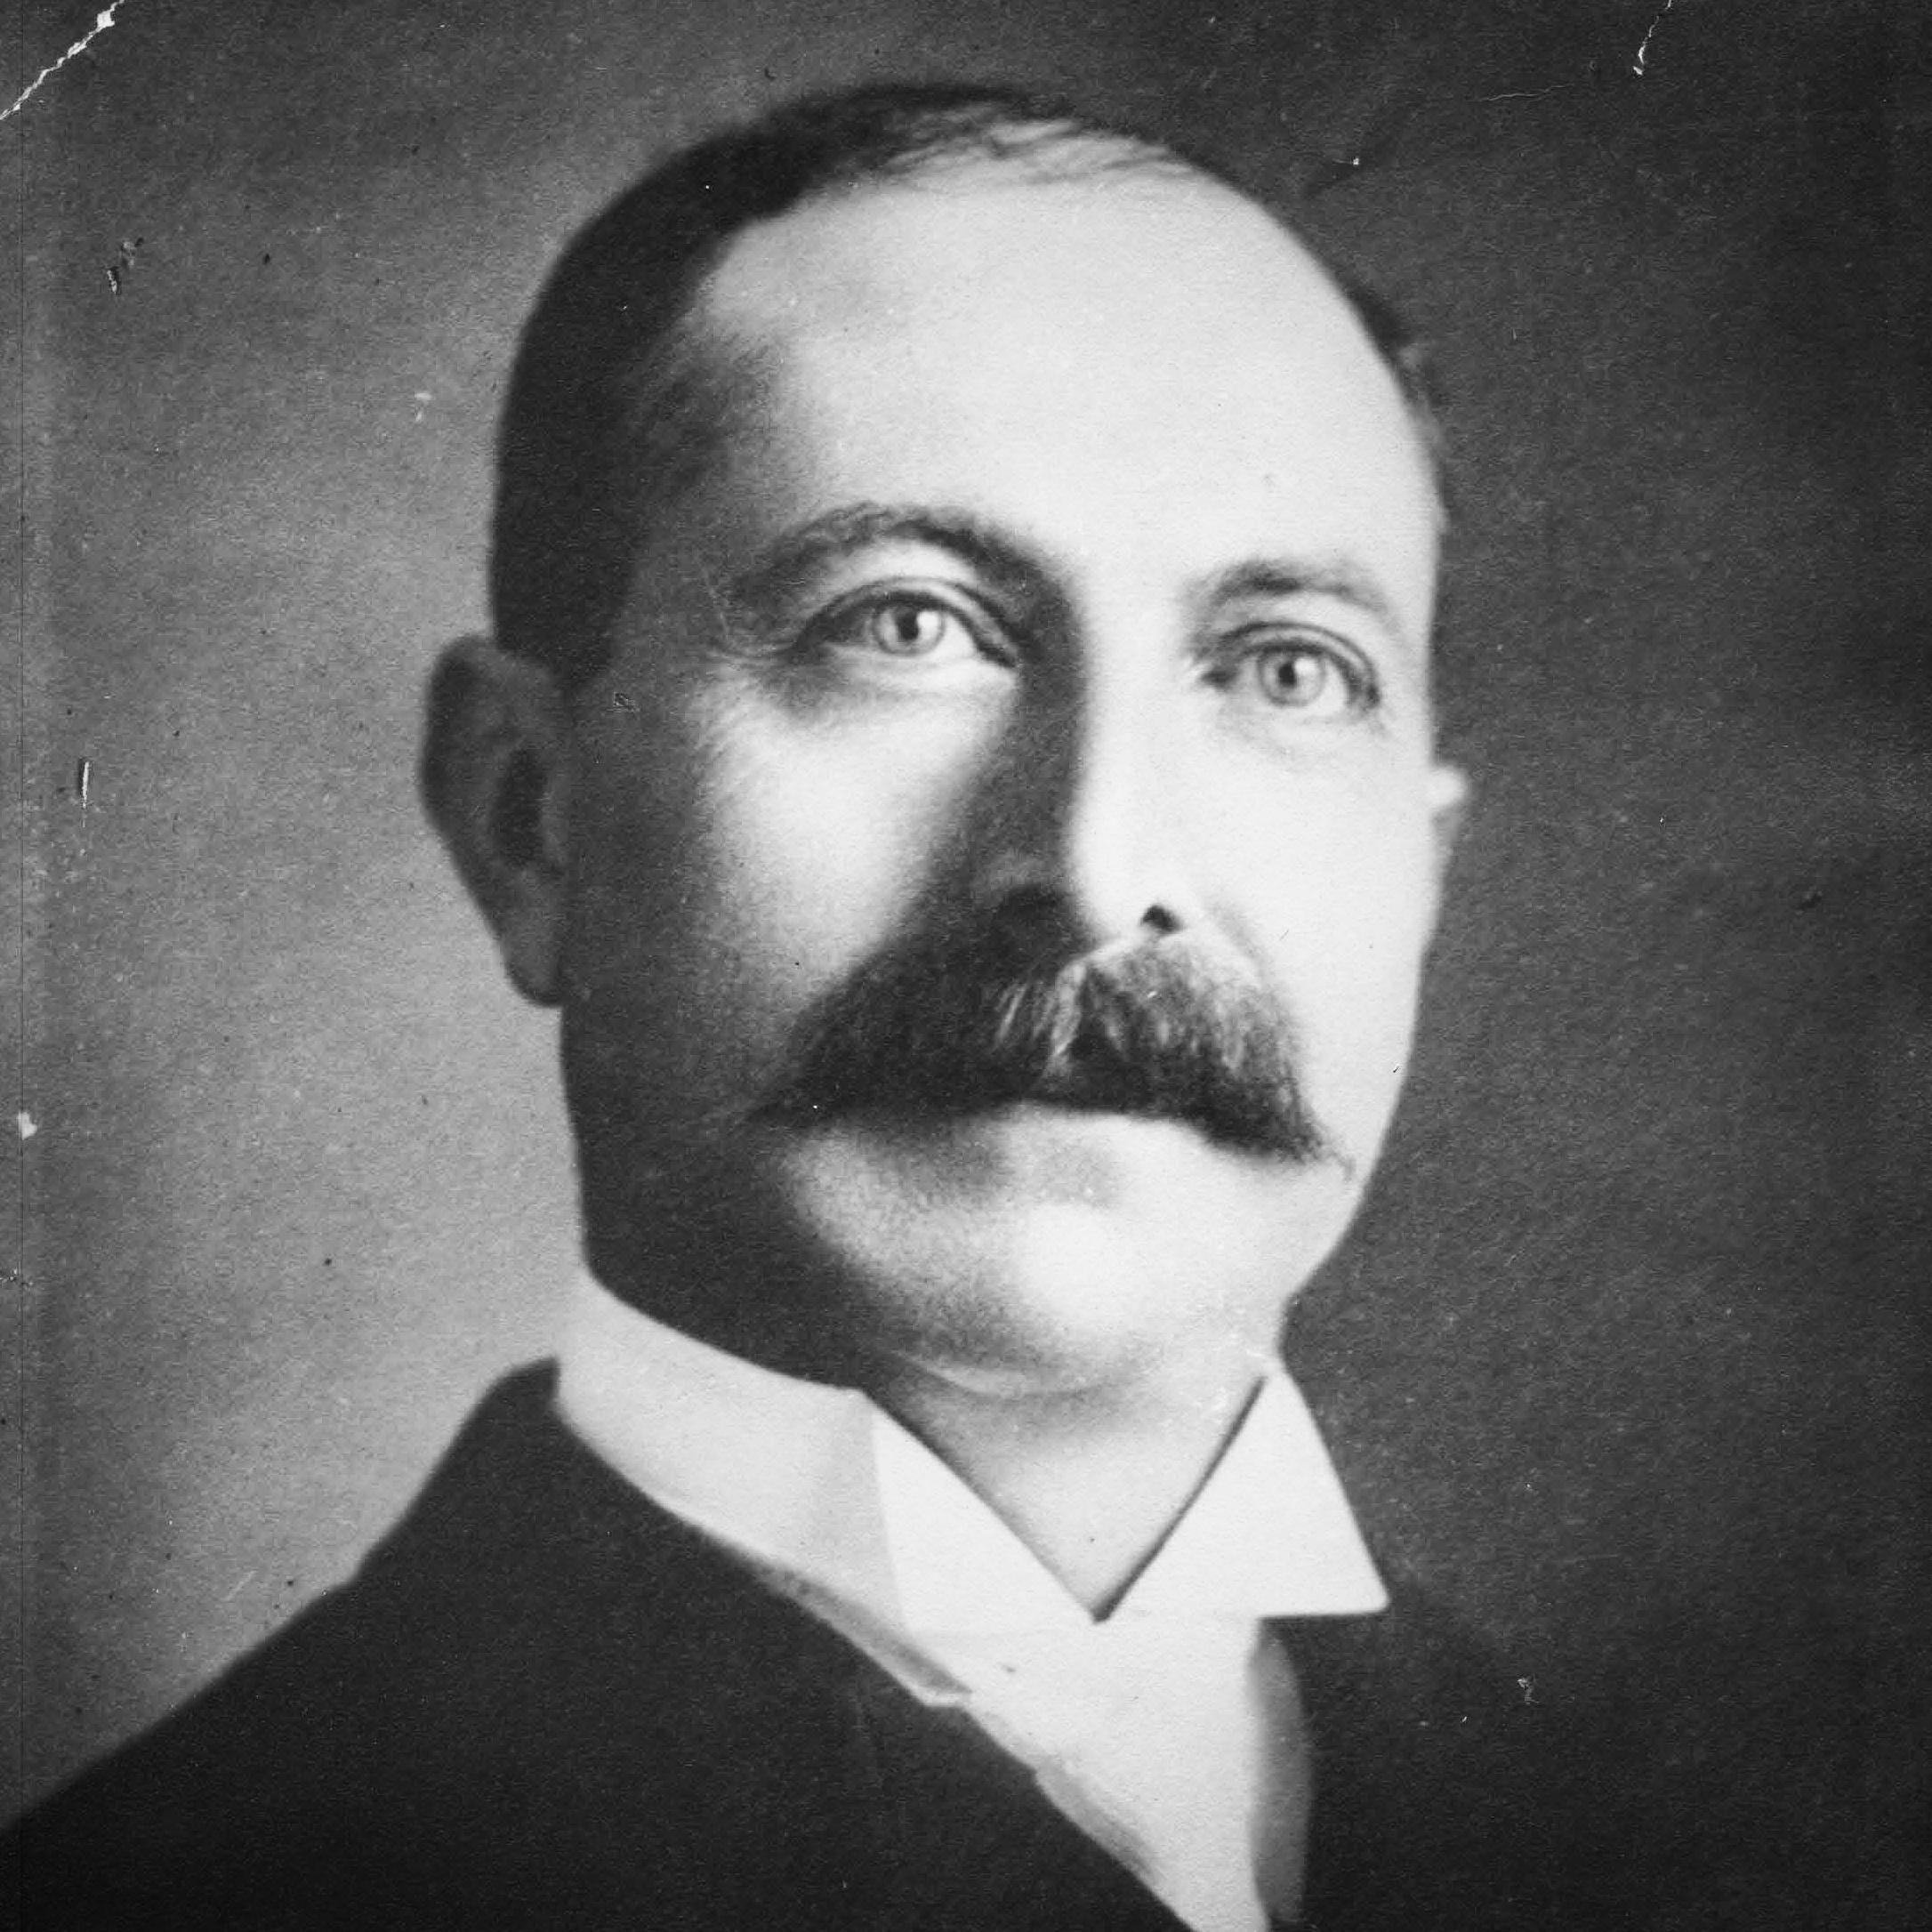 Rev. H. B. Garabedian 1901-1908